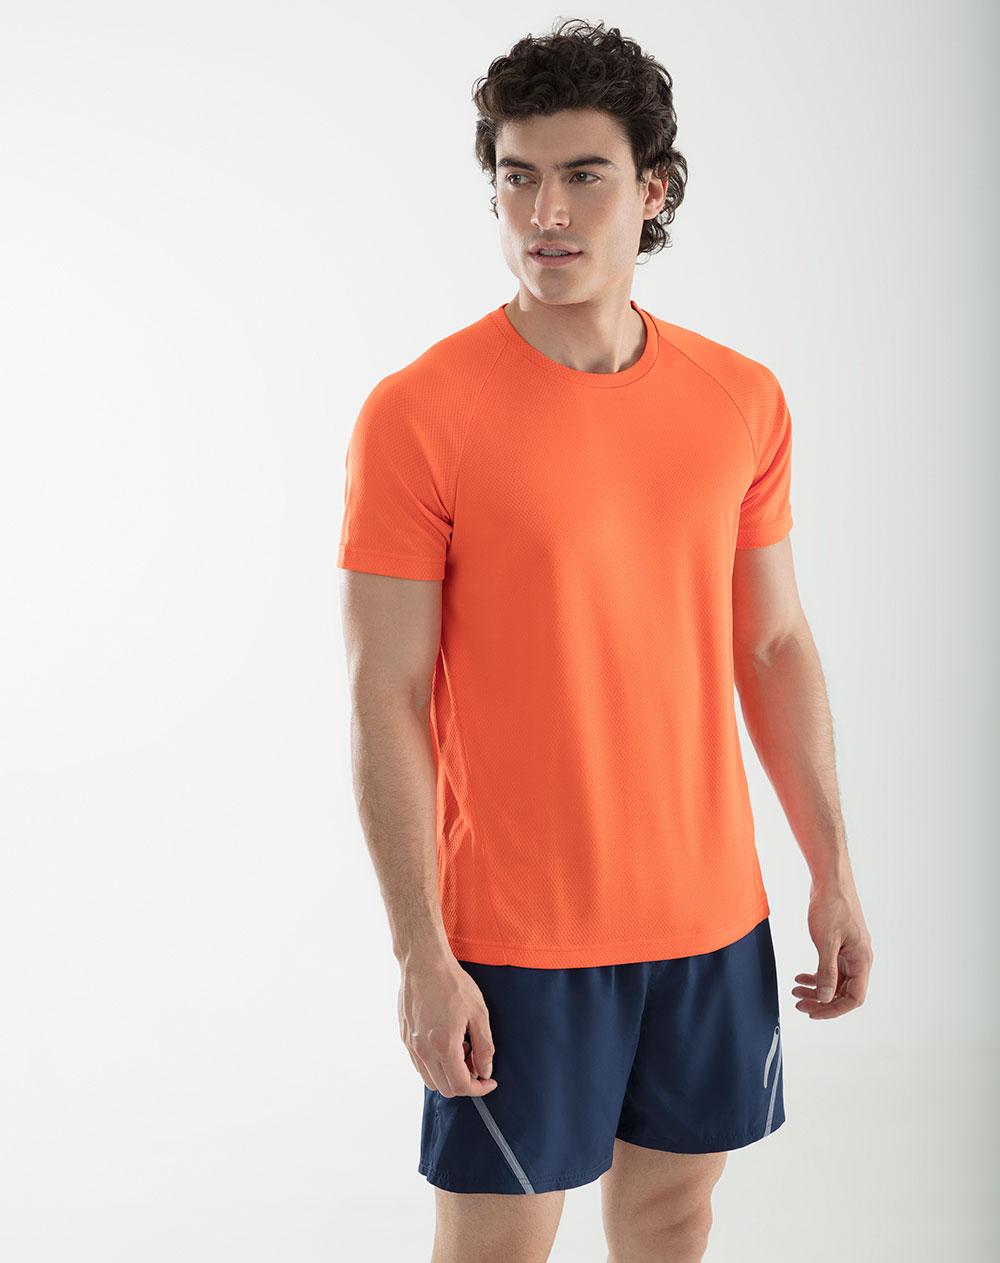 Blanco Cuello Camiseta Hombre Bruni Brillante Redondo De Punto Naranja kuwPZTOXi